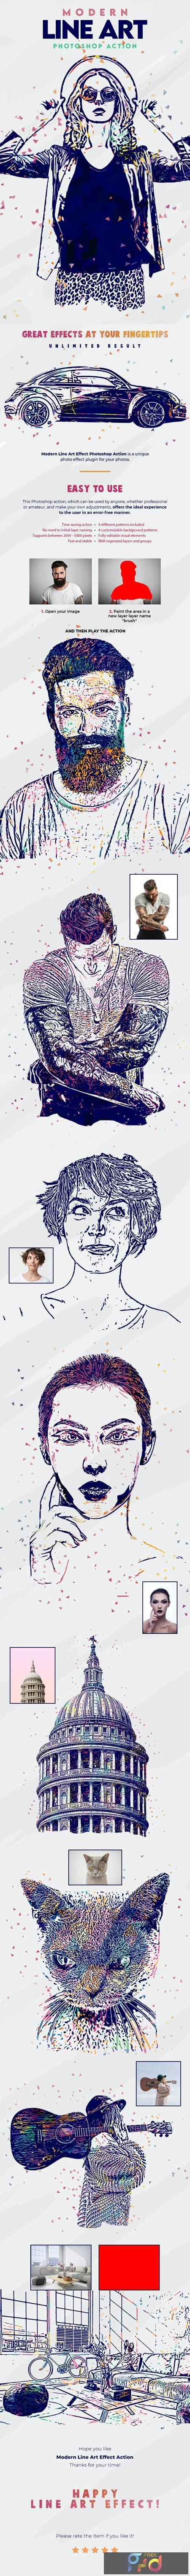 Modern Line Art Effect Photoshop Action 26986358 1